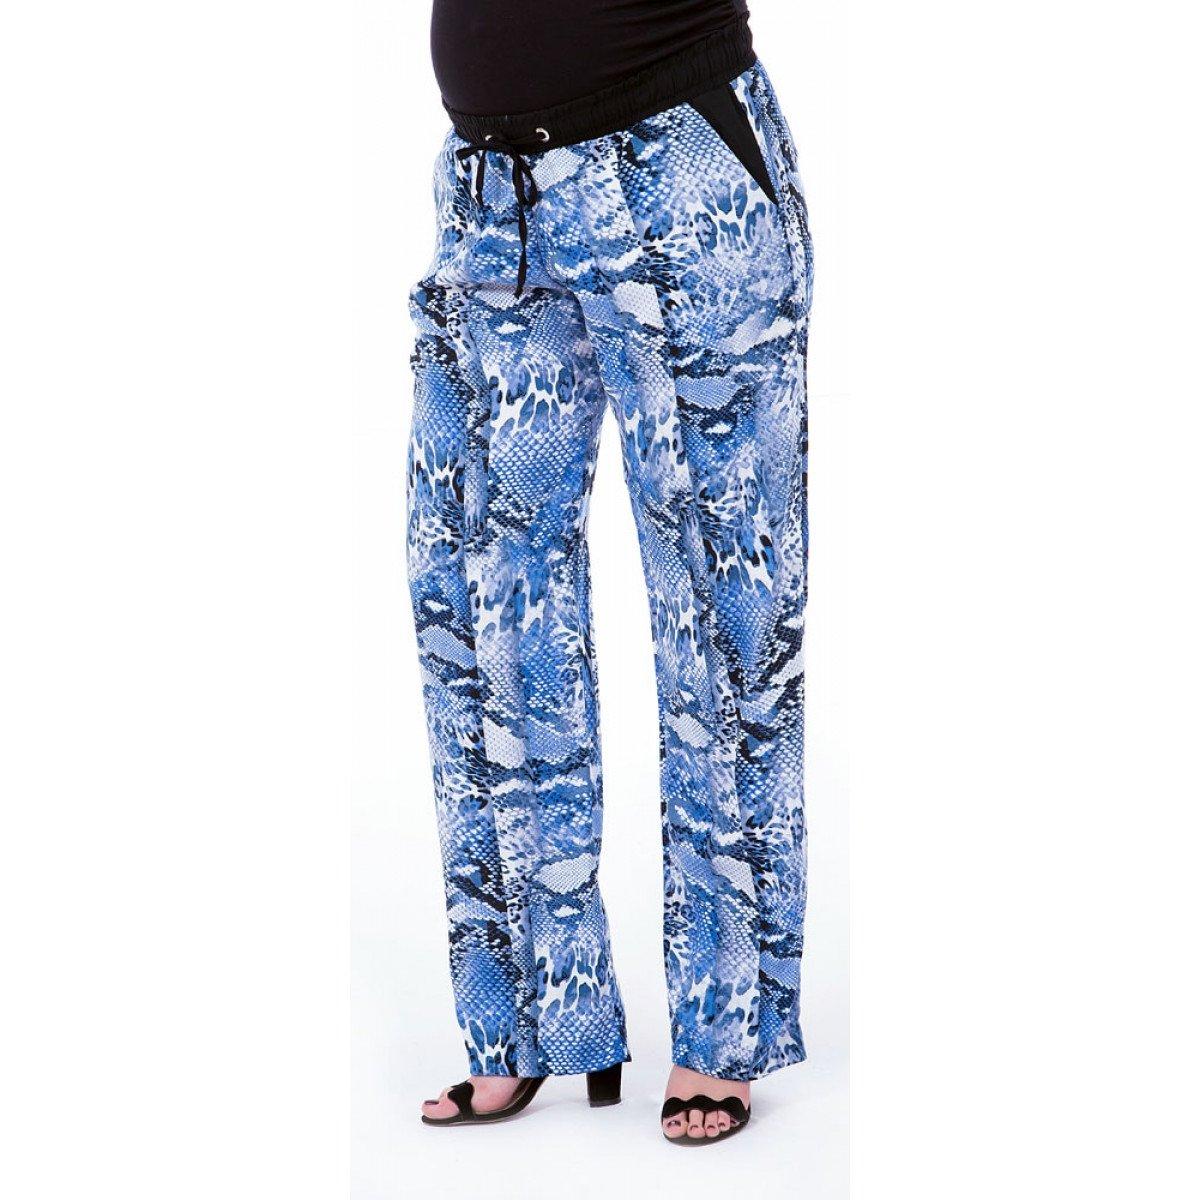 7bd87a822 Calça Gestante Pijama Viscose Estampada   Netshoes